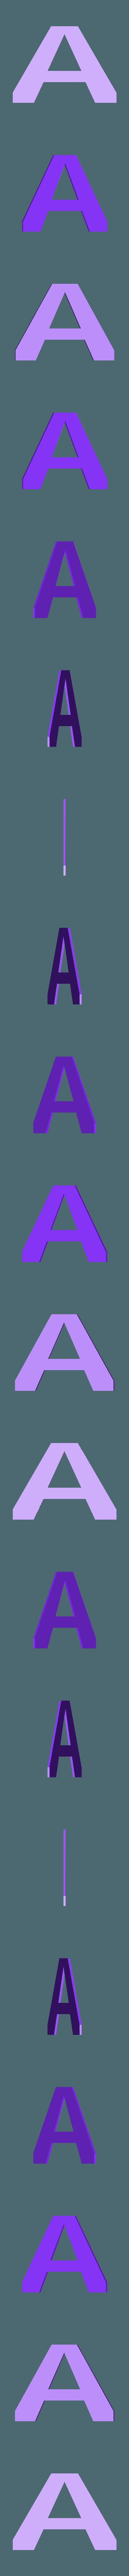 TAPA A.stl Download free STL file LUMINOUS LED NAME - SEA • 3D printable design, cristotier